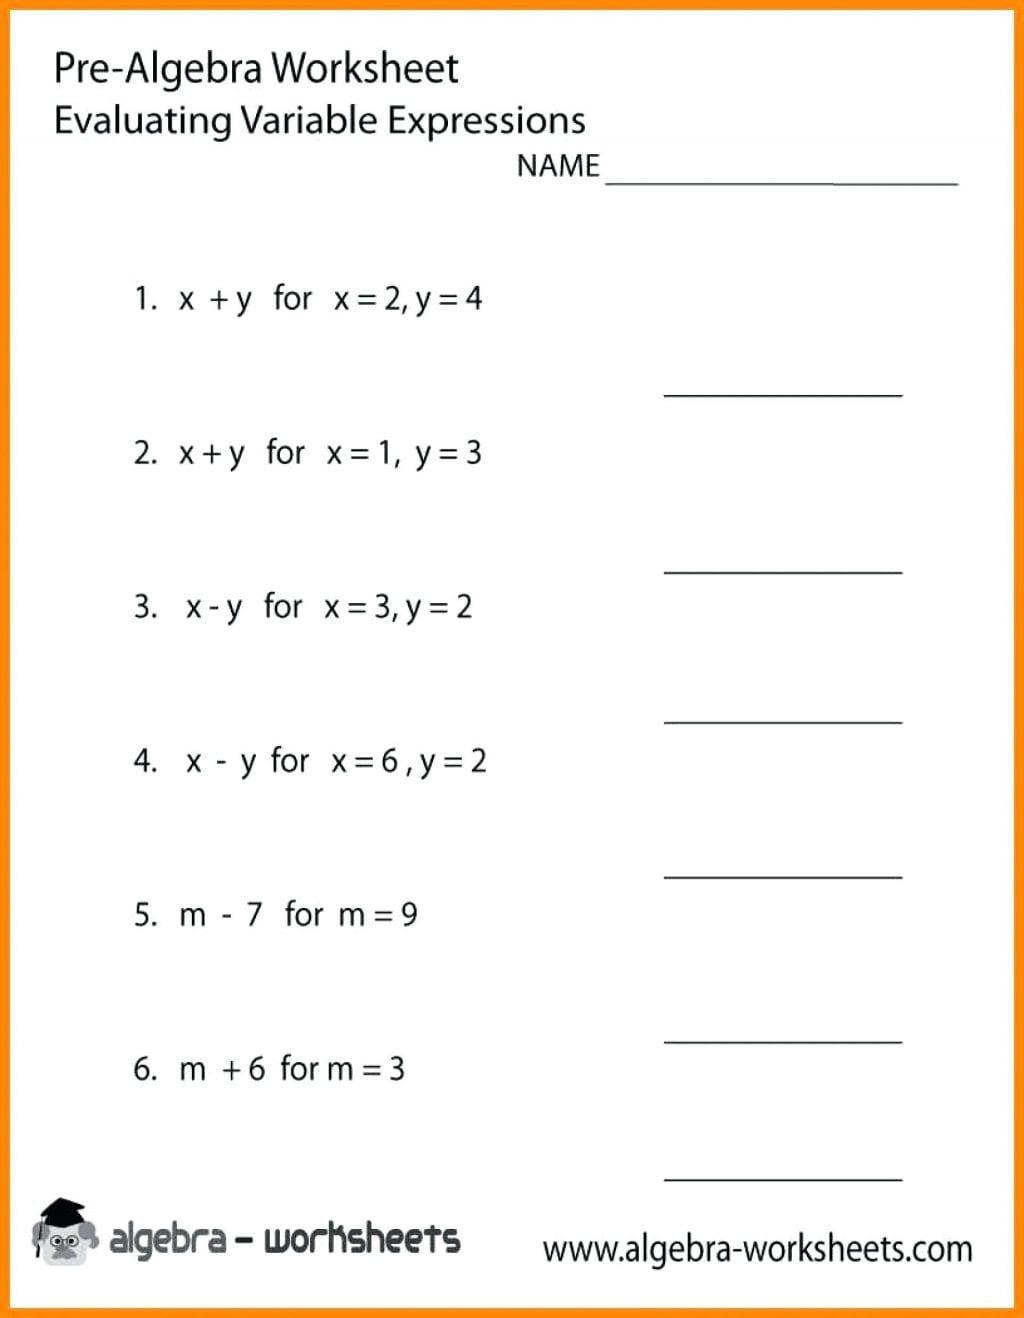 Worksheet Ideas Basic Algebra Worksheets Equations